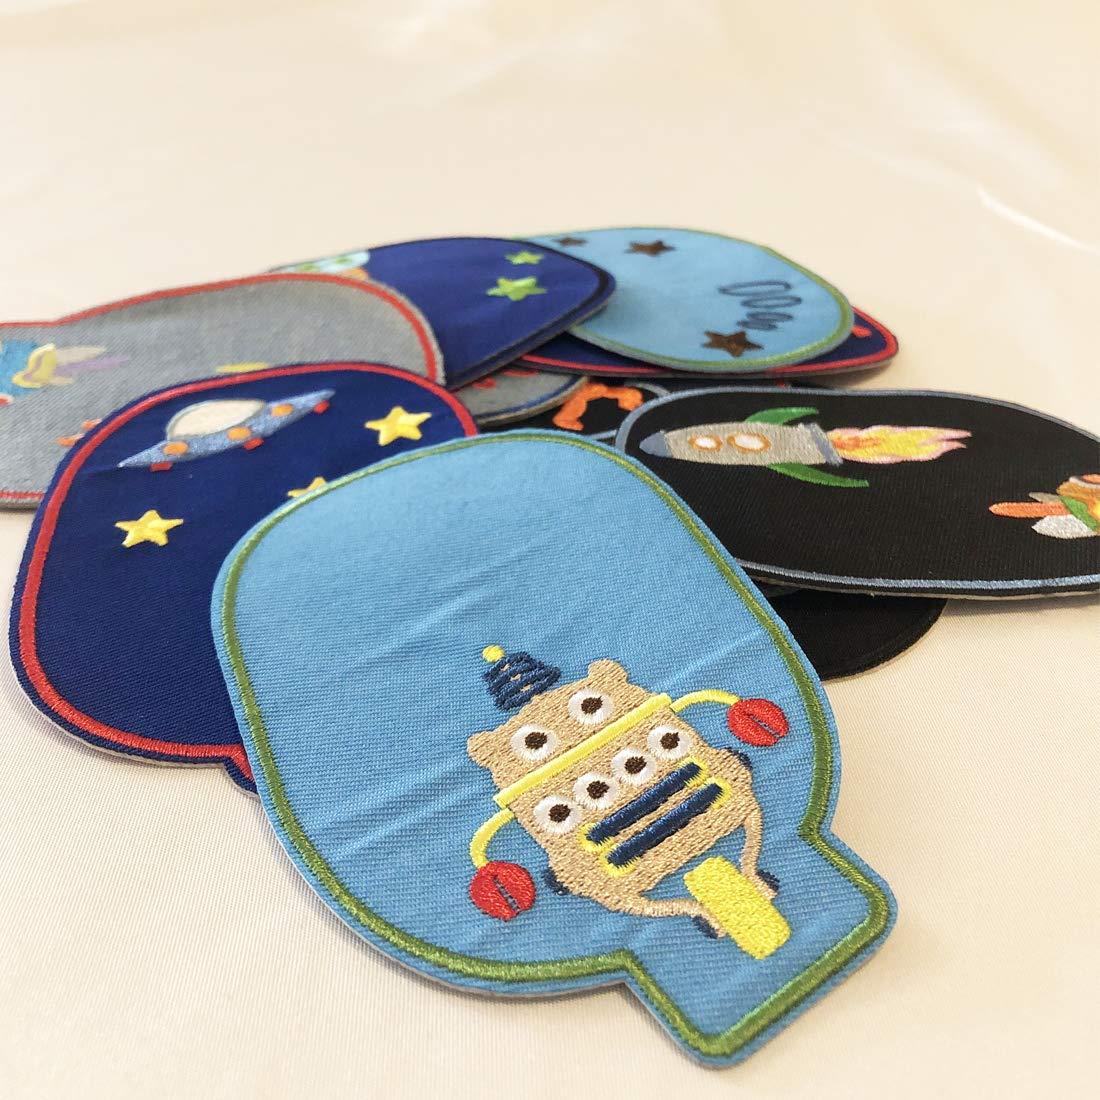 Parches bordados para planchar con diseño de astronauta espacial ...